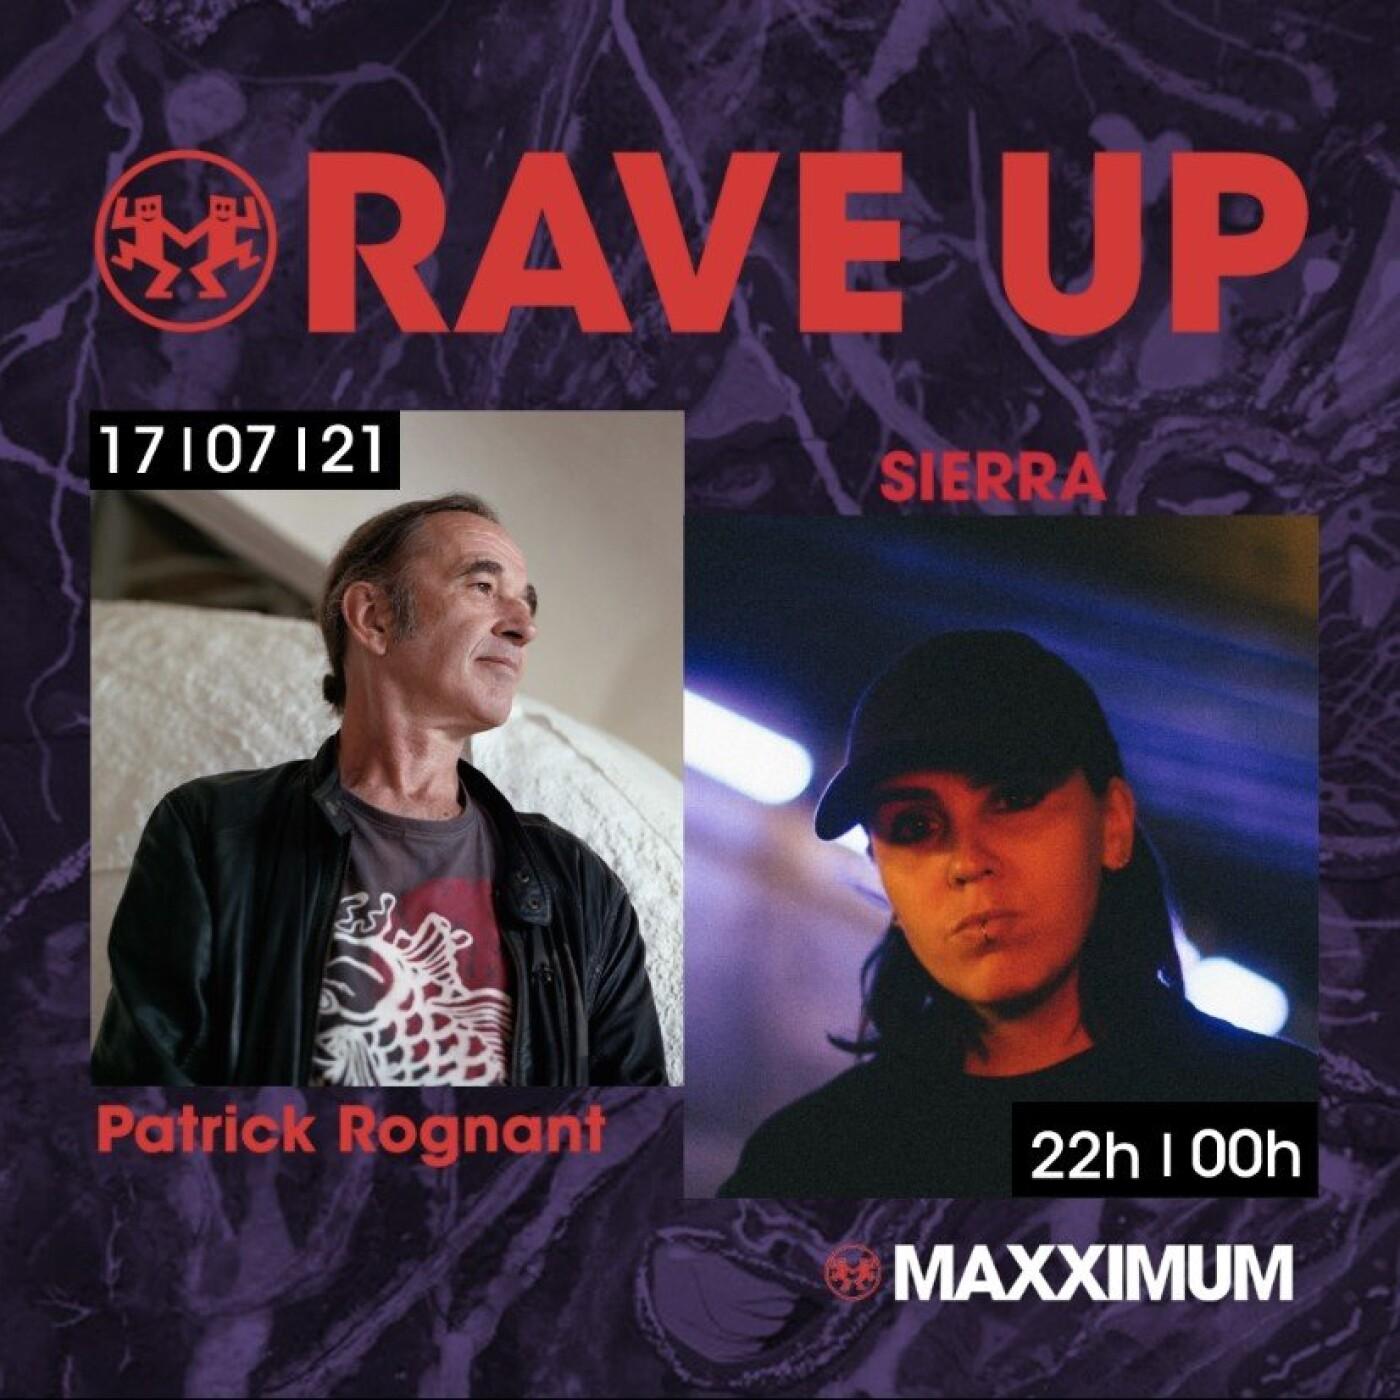 RAVE UP : SIERRA